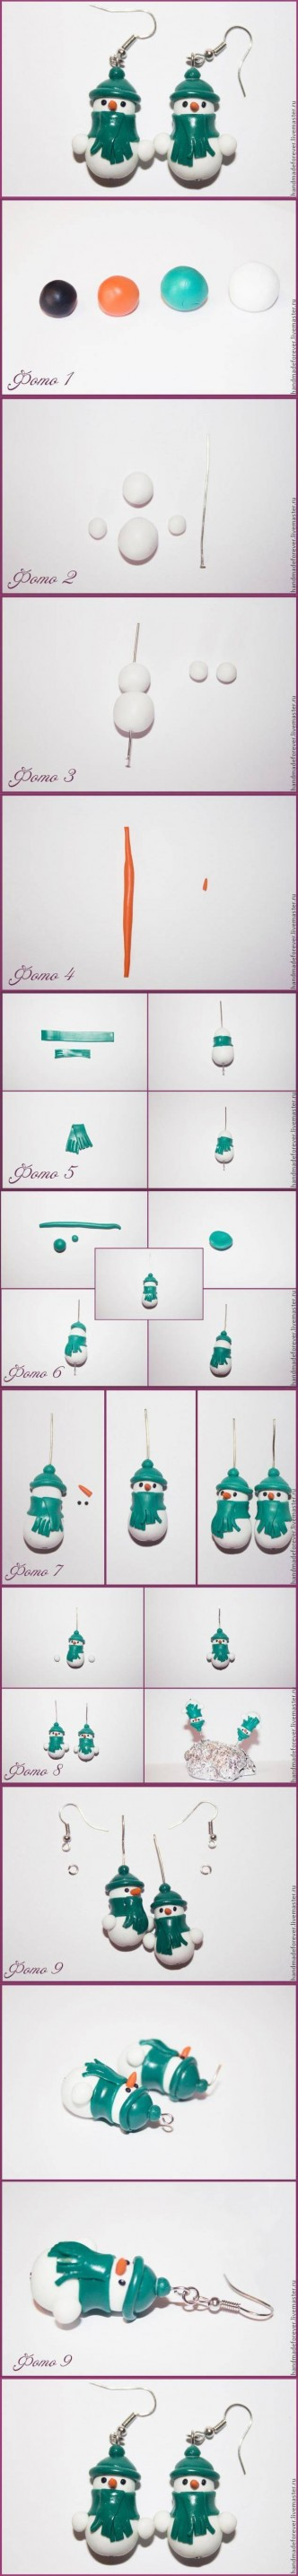 DIY Clay Snowman Earrings DIY Projects